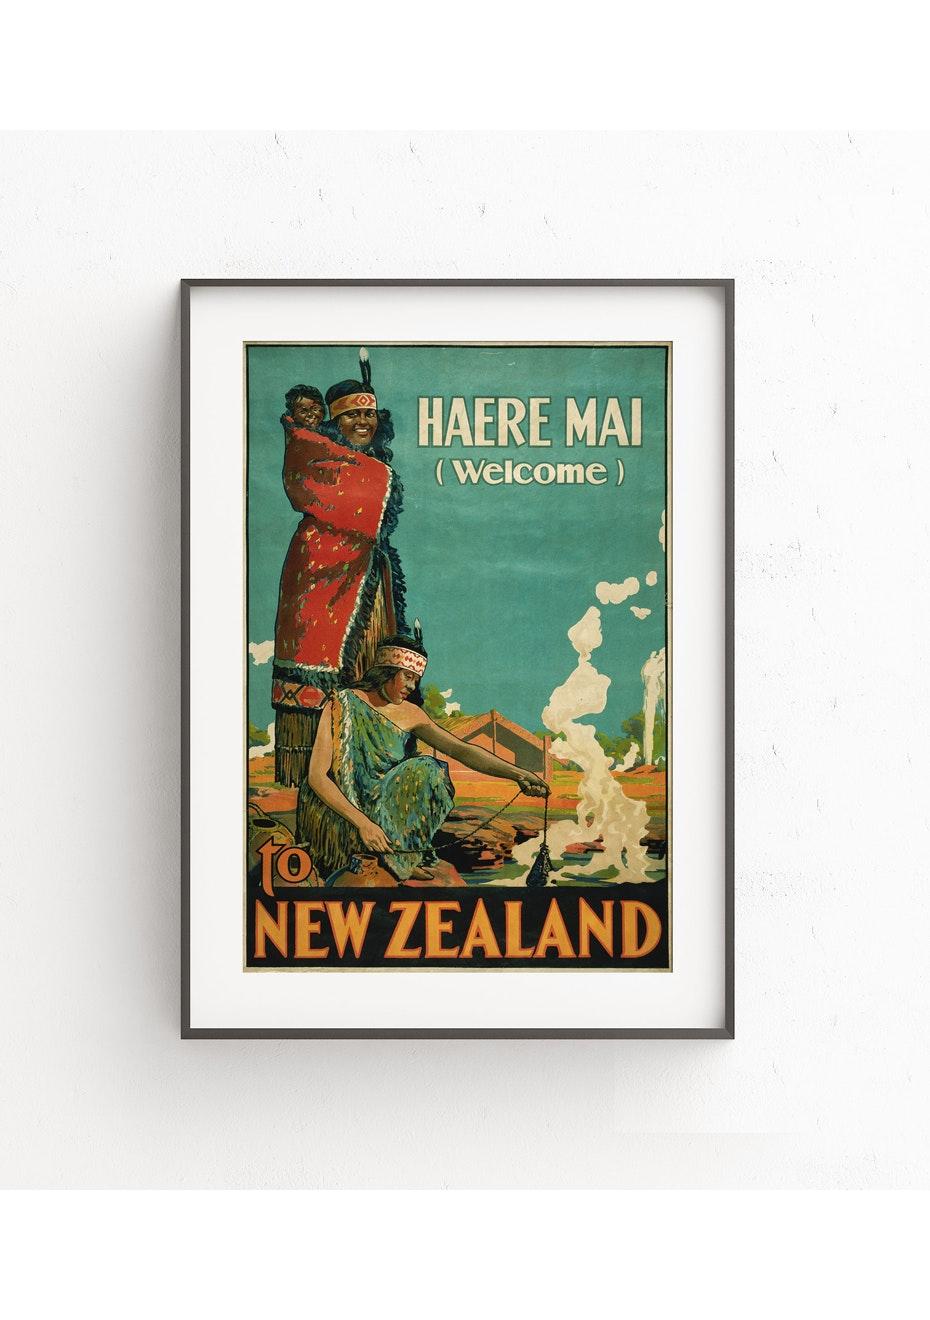 Haere Mai Vintage Tourist Print - A1